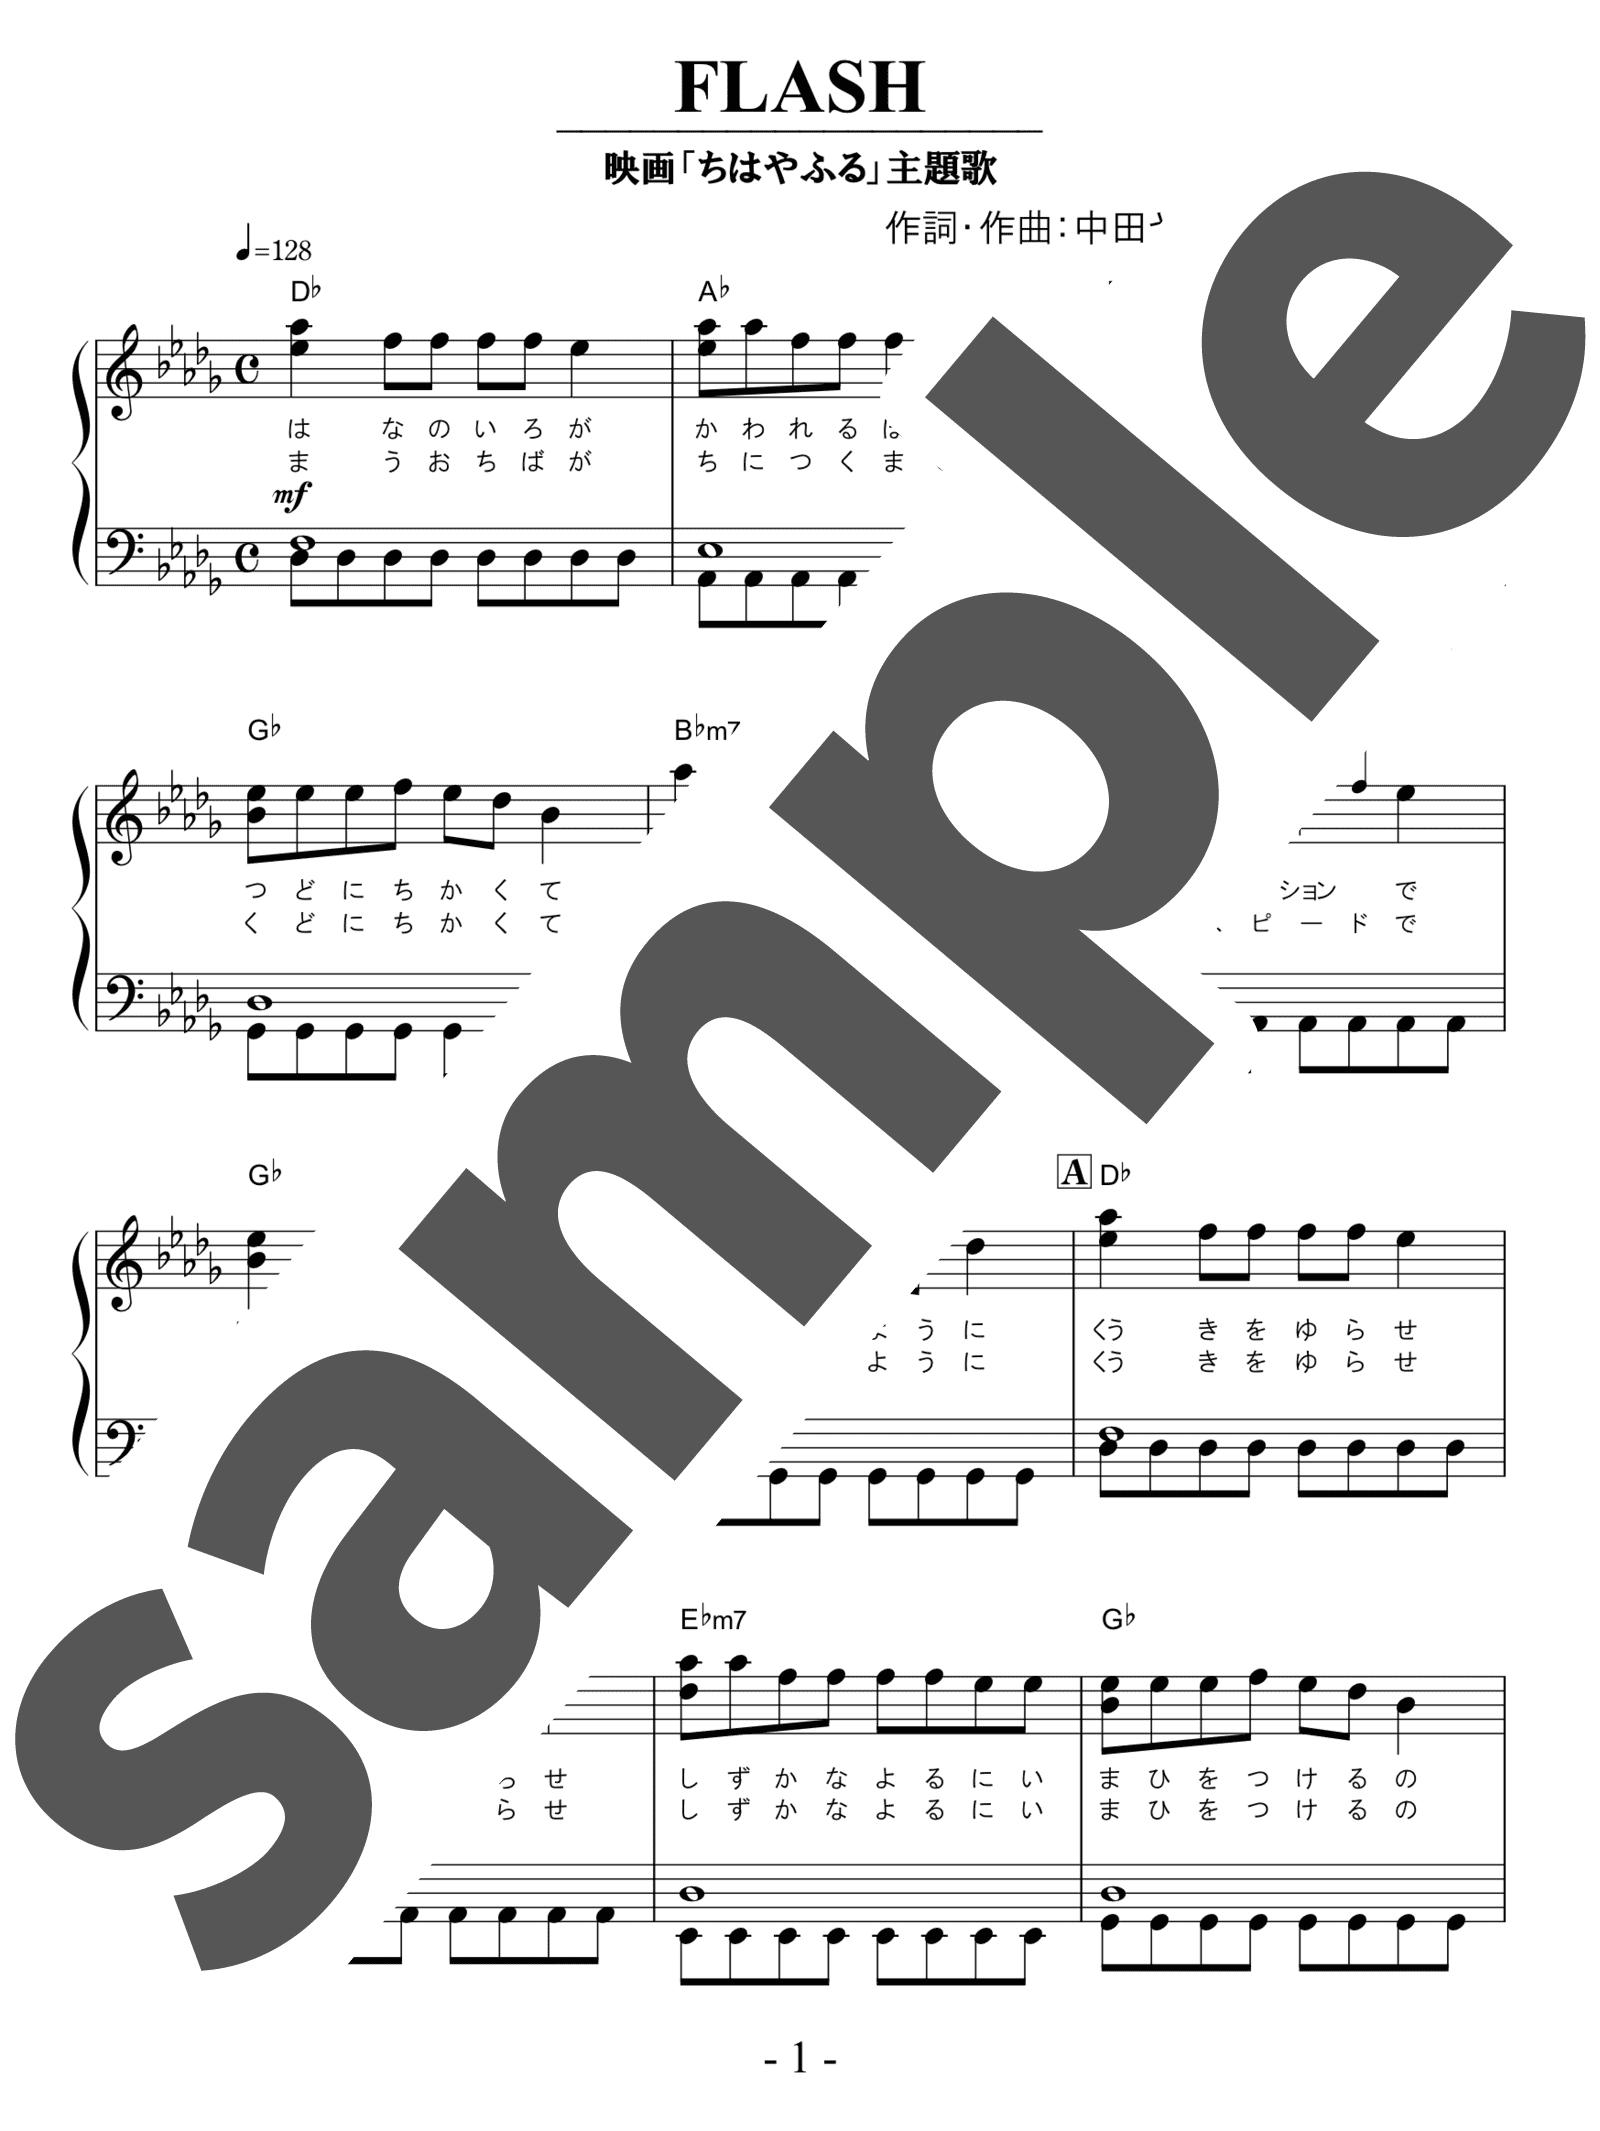 「FLASH」のサンプル楽譜